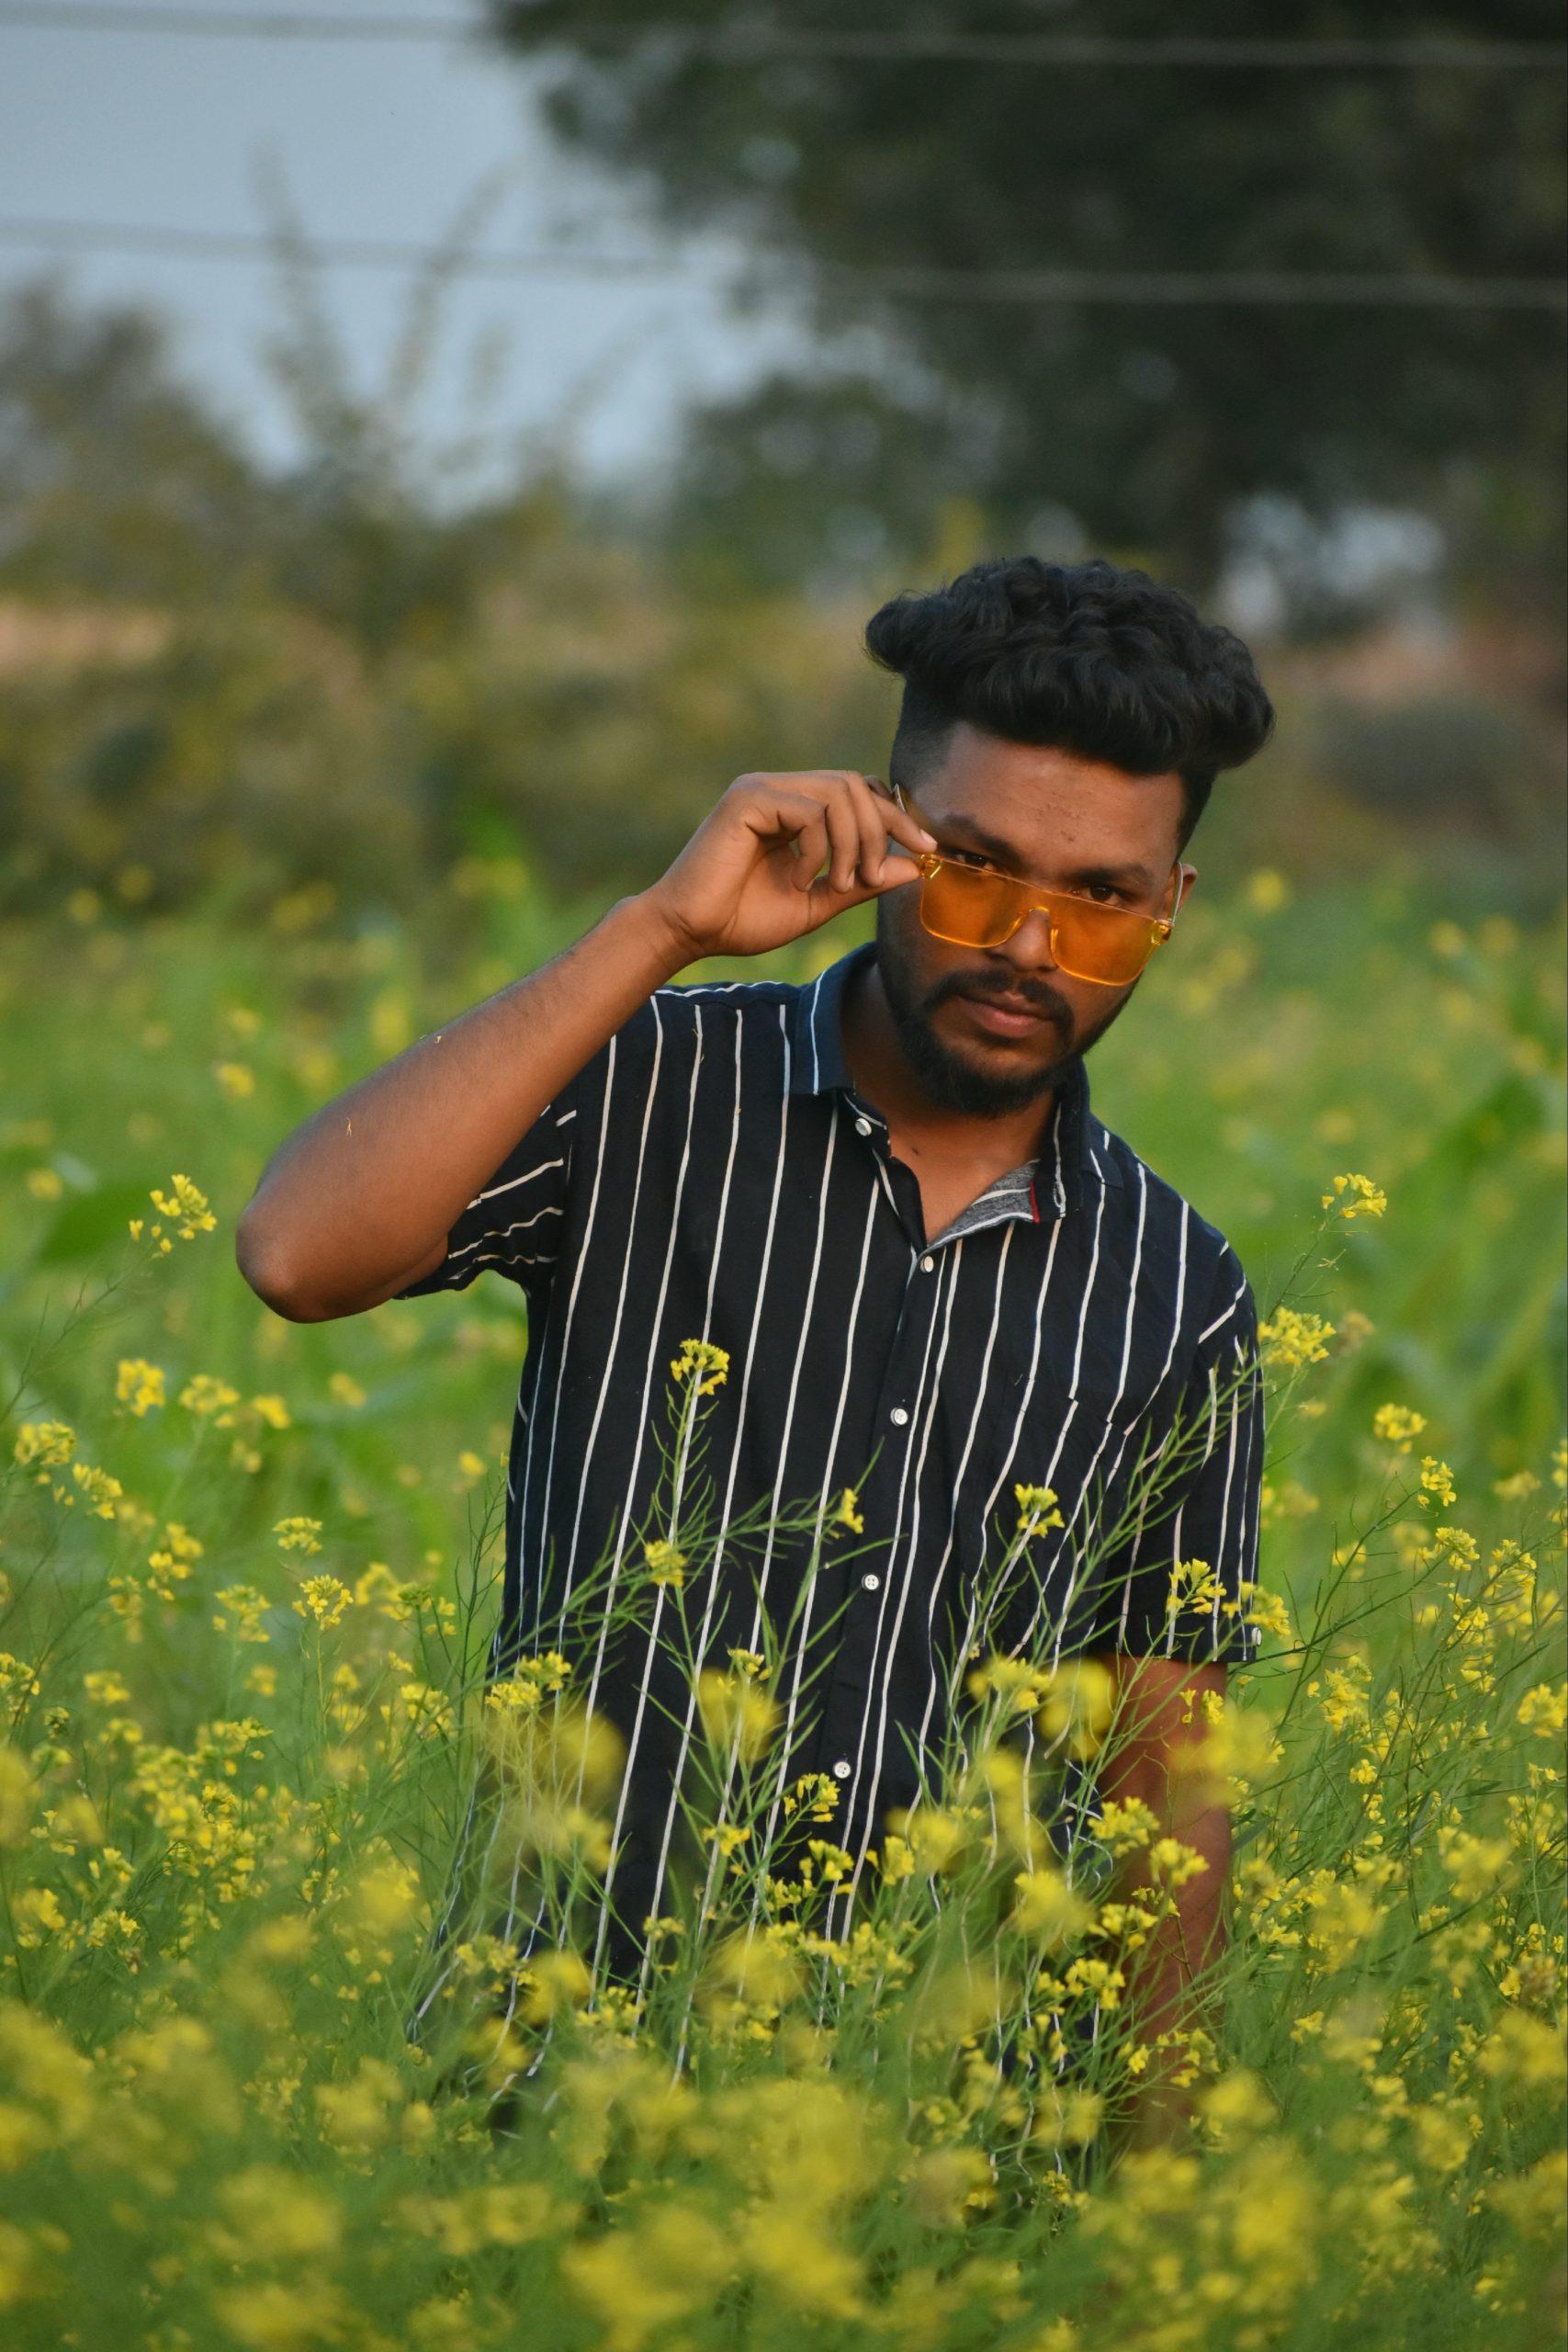 A stylish boy in mustard plant field